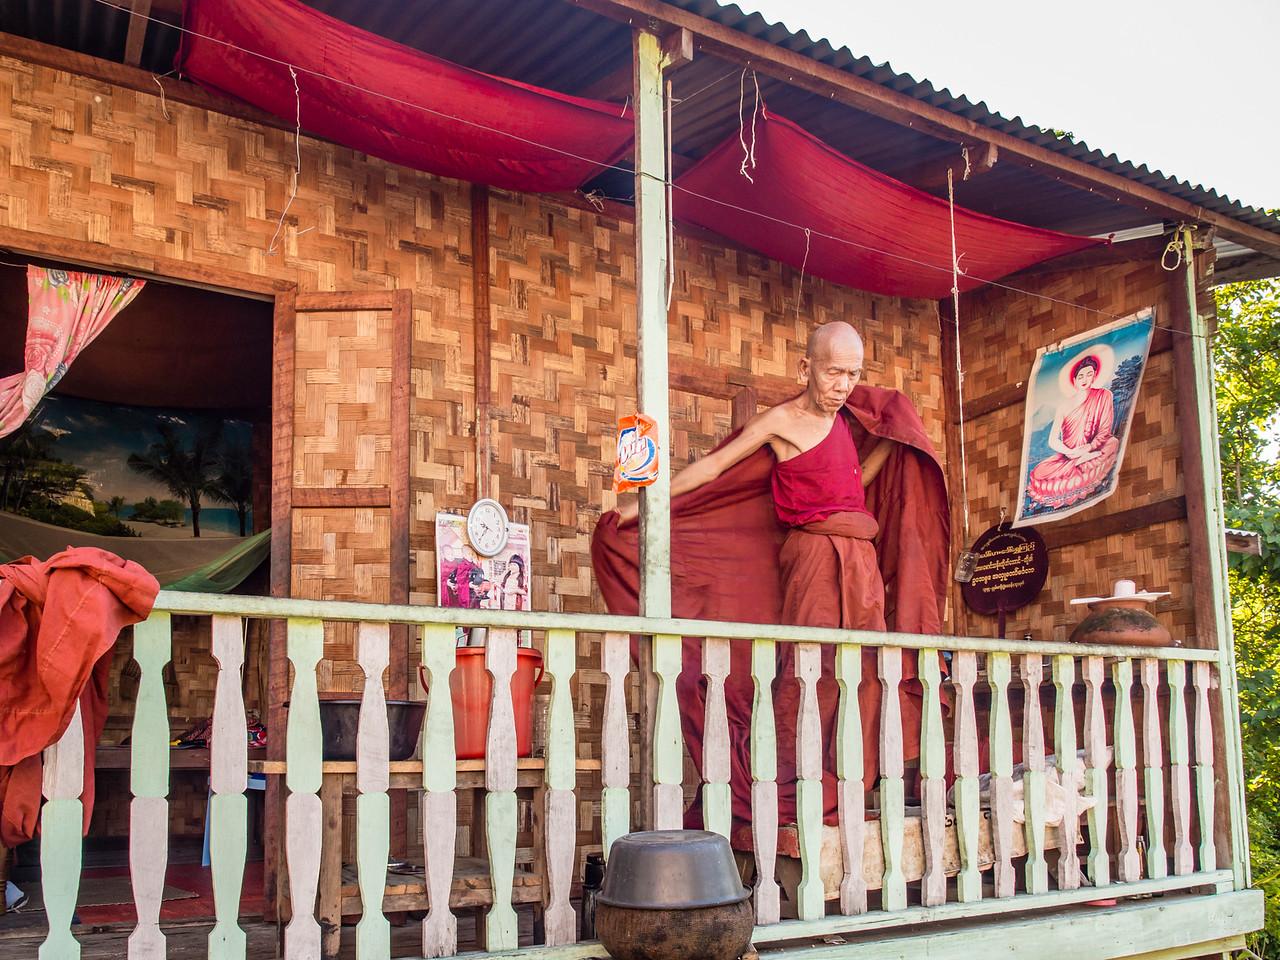 Kani, Myanmar on the Chindwin River